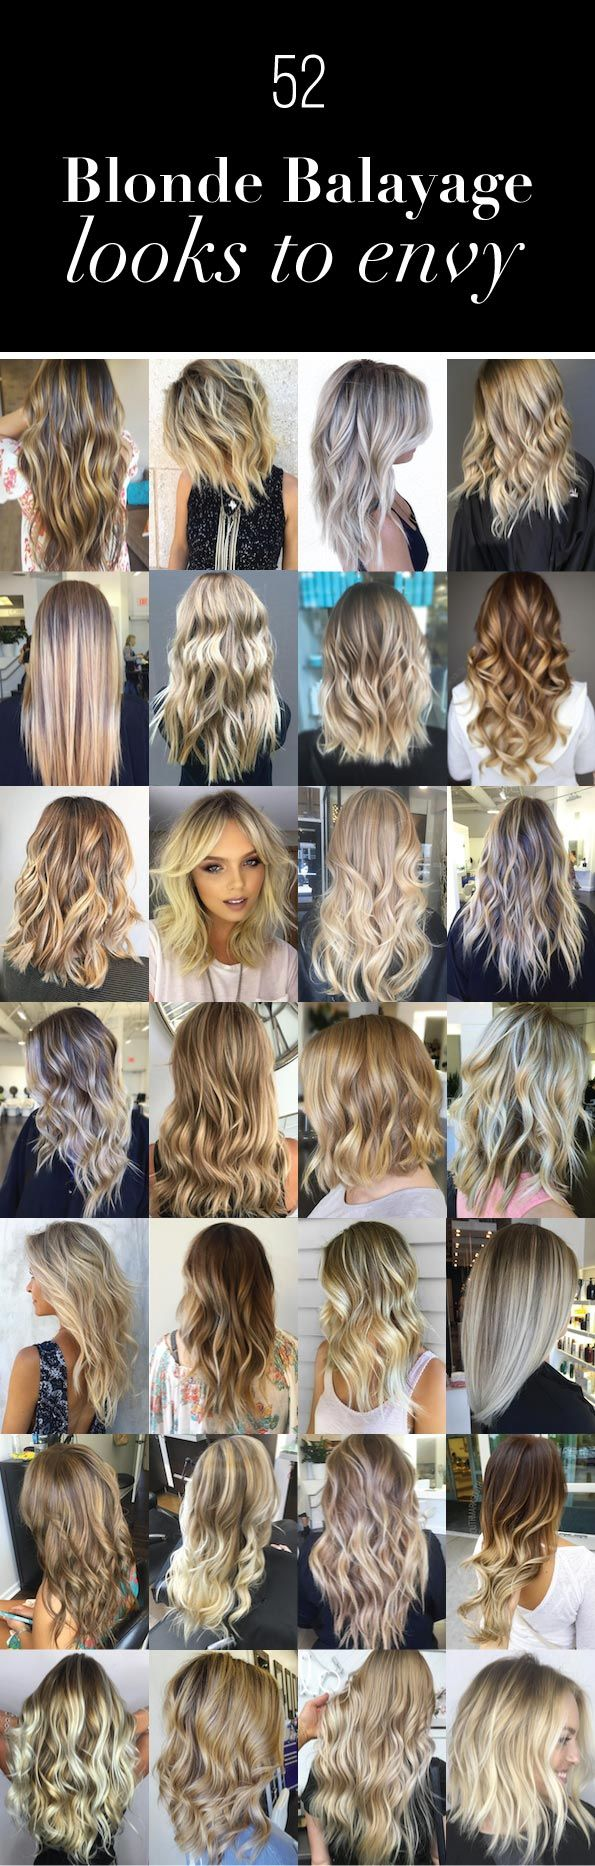 Share Tweet Pin Mail Long dynamic blonde balayage. (Alohi Lewis) Straight platinum blonde balayage. (Capelli) Short and textured. (Brenda Kamt) Gorgeous honey waves. (Amber ...